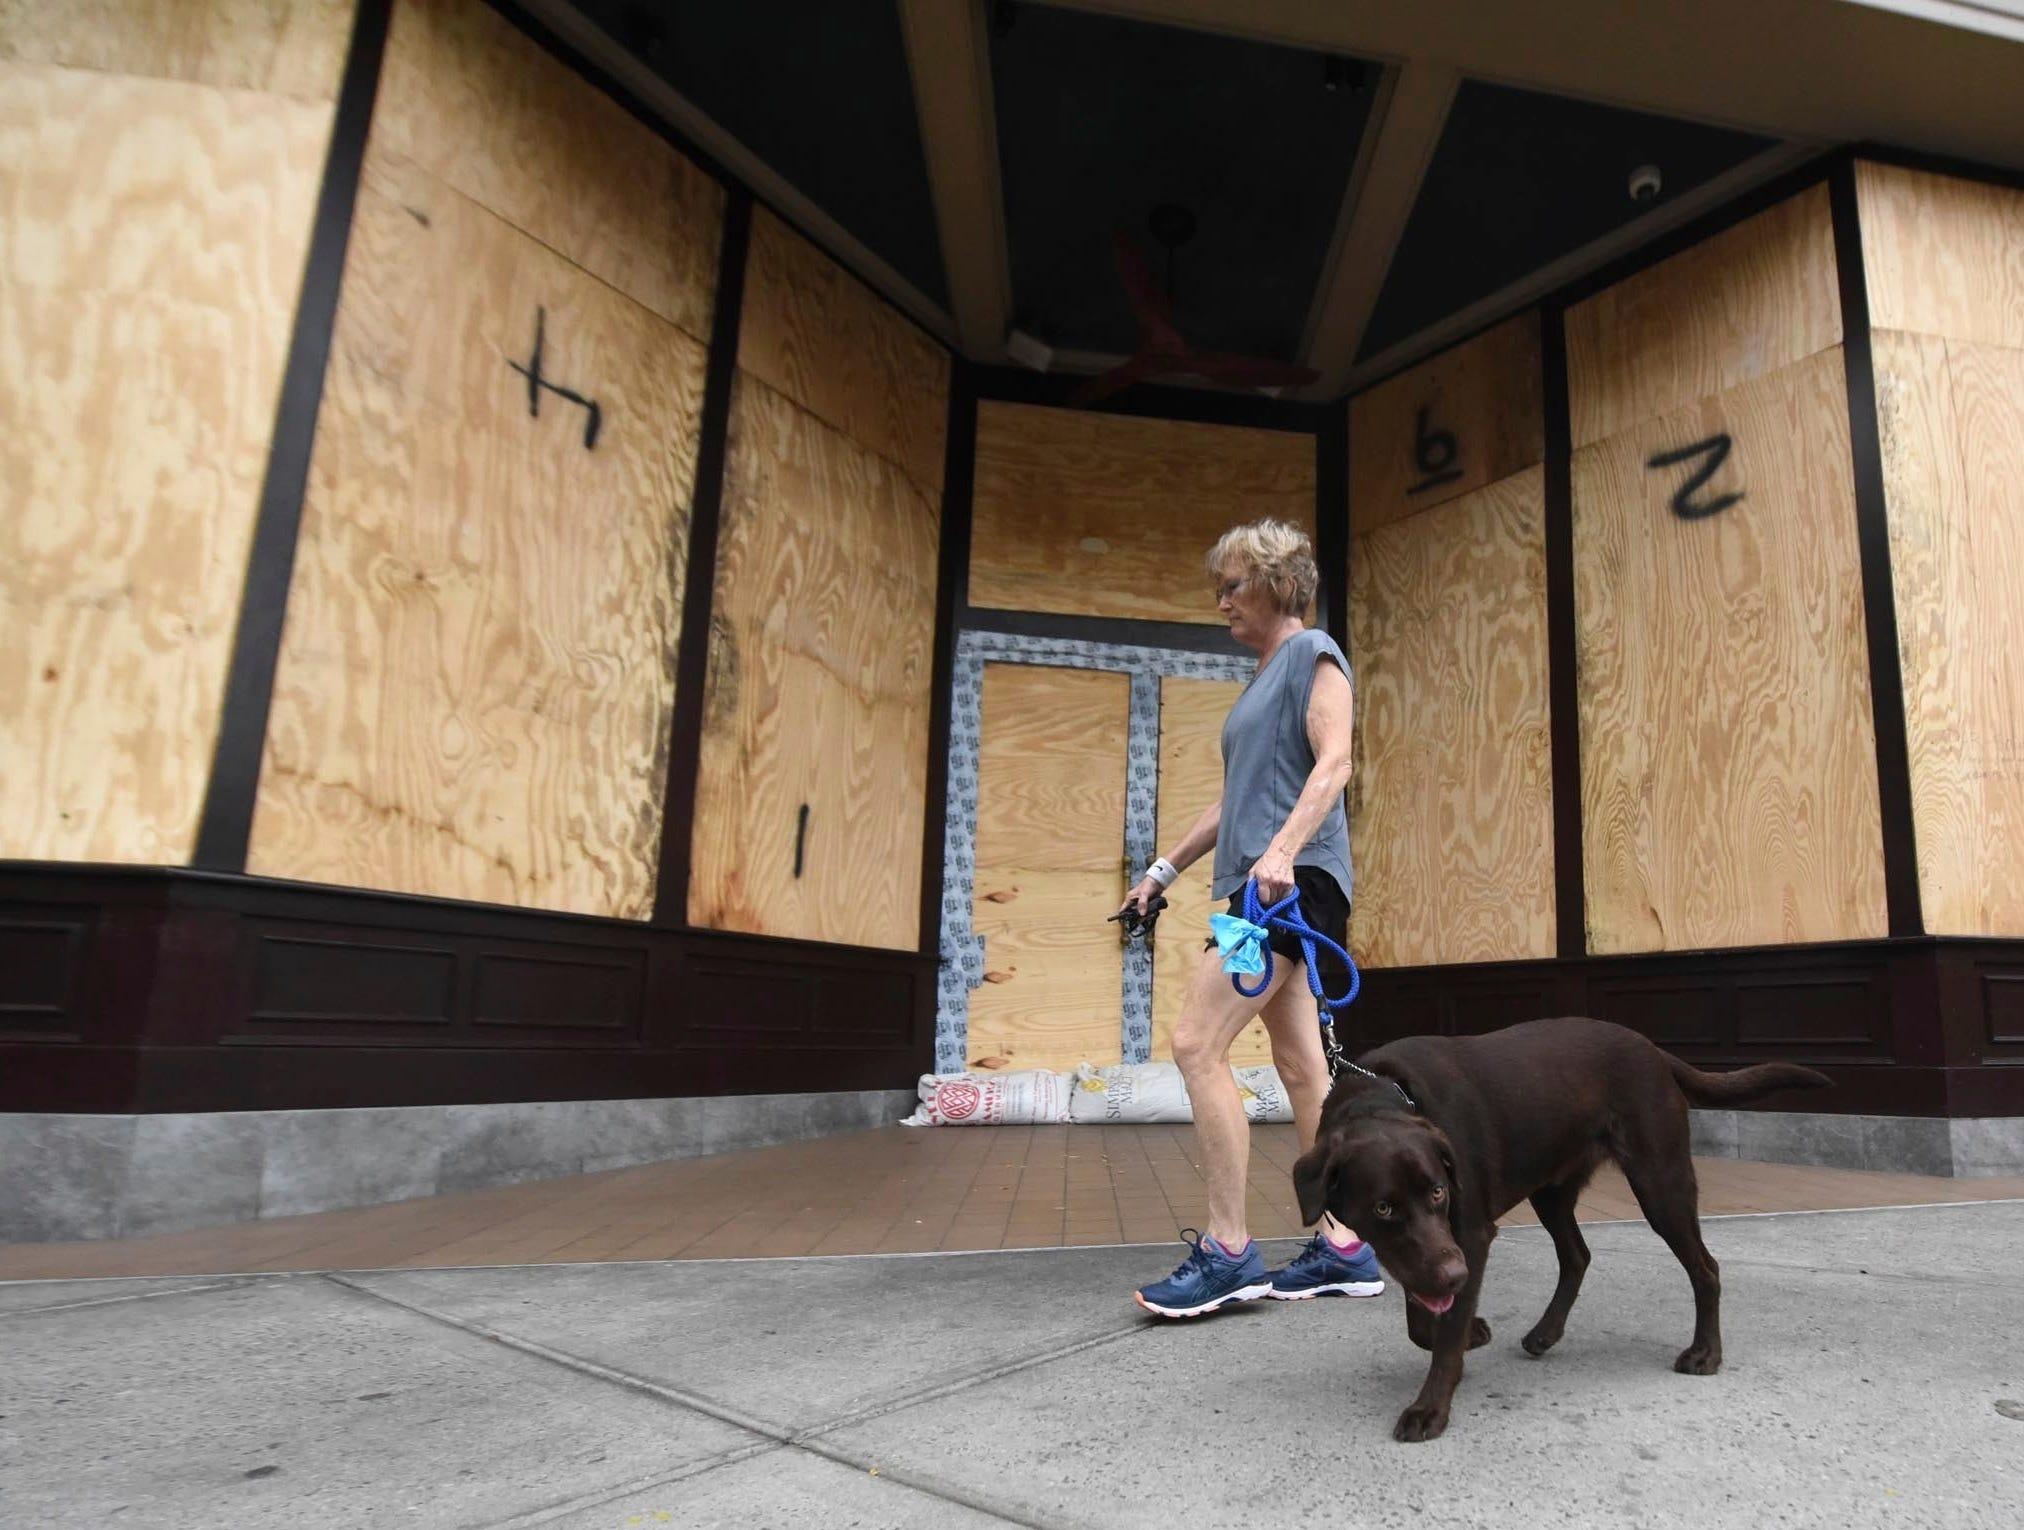 Deborah Covington walks his dog past Front Street Brewery in downtown Wilmington, N.C., Thursday, Sept. 13, 2018 ahead of Hurricane Florence.  (Matt Born/The Star-News via AP)